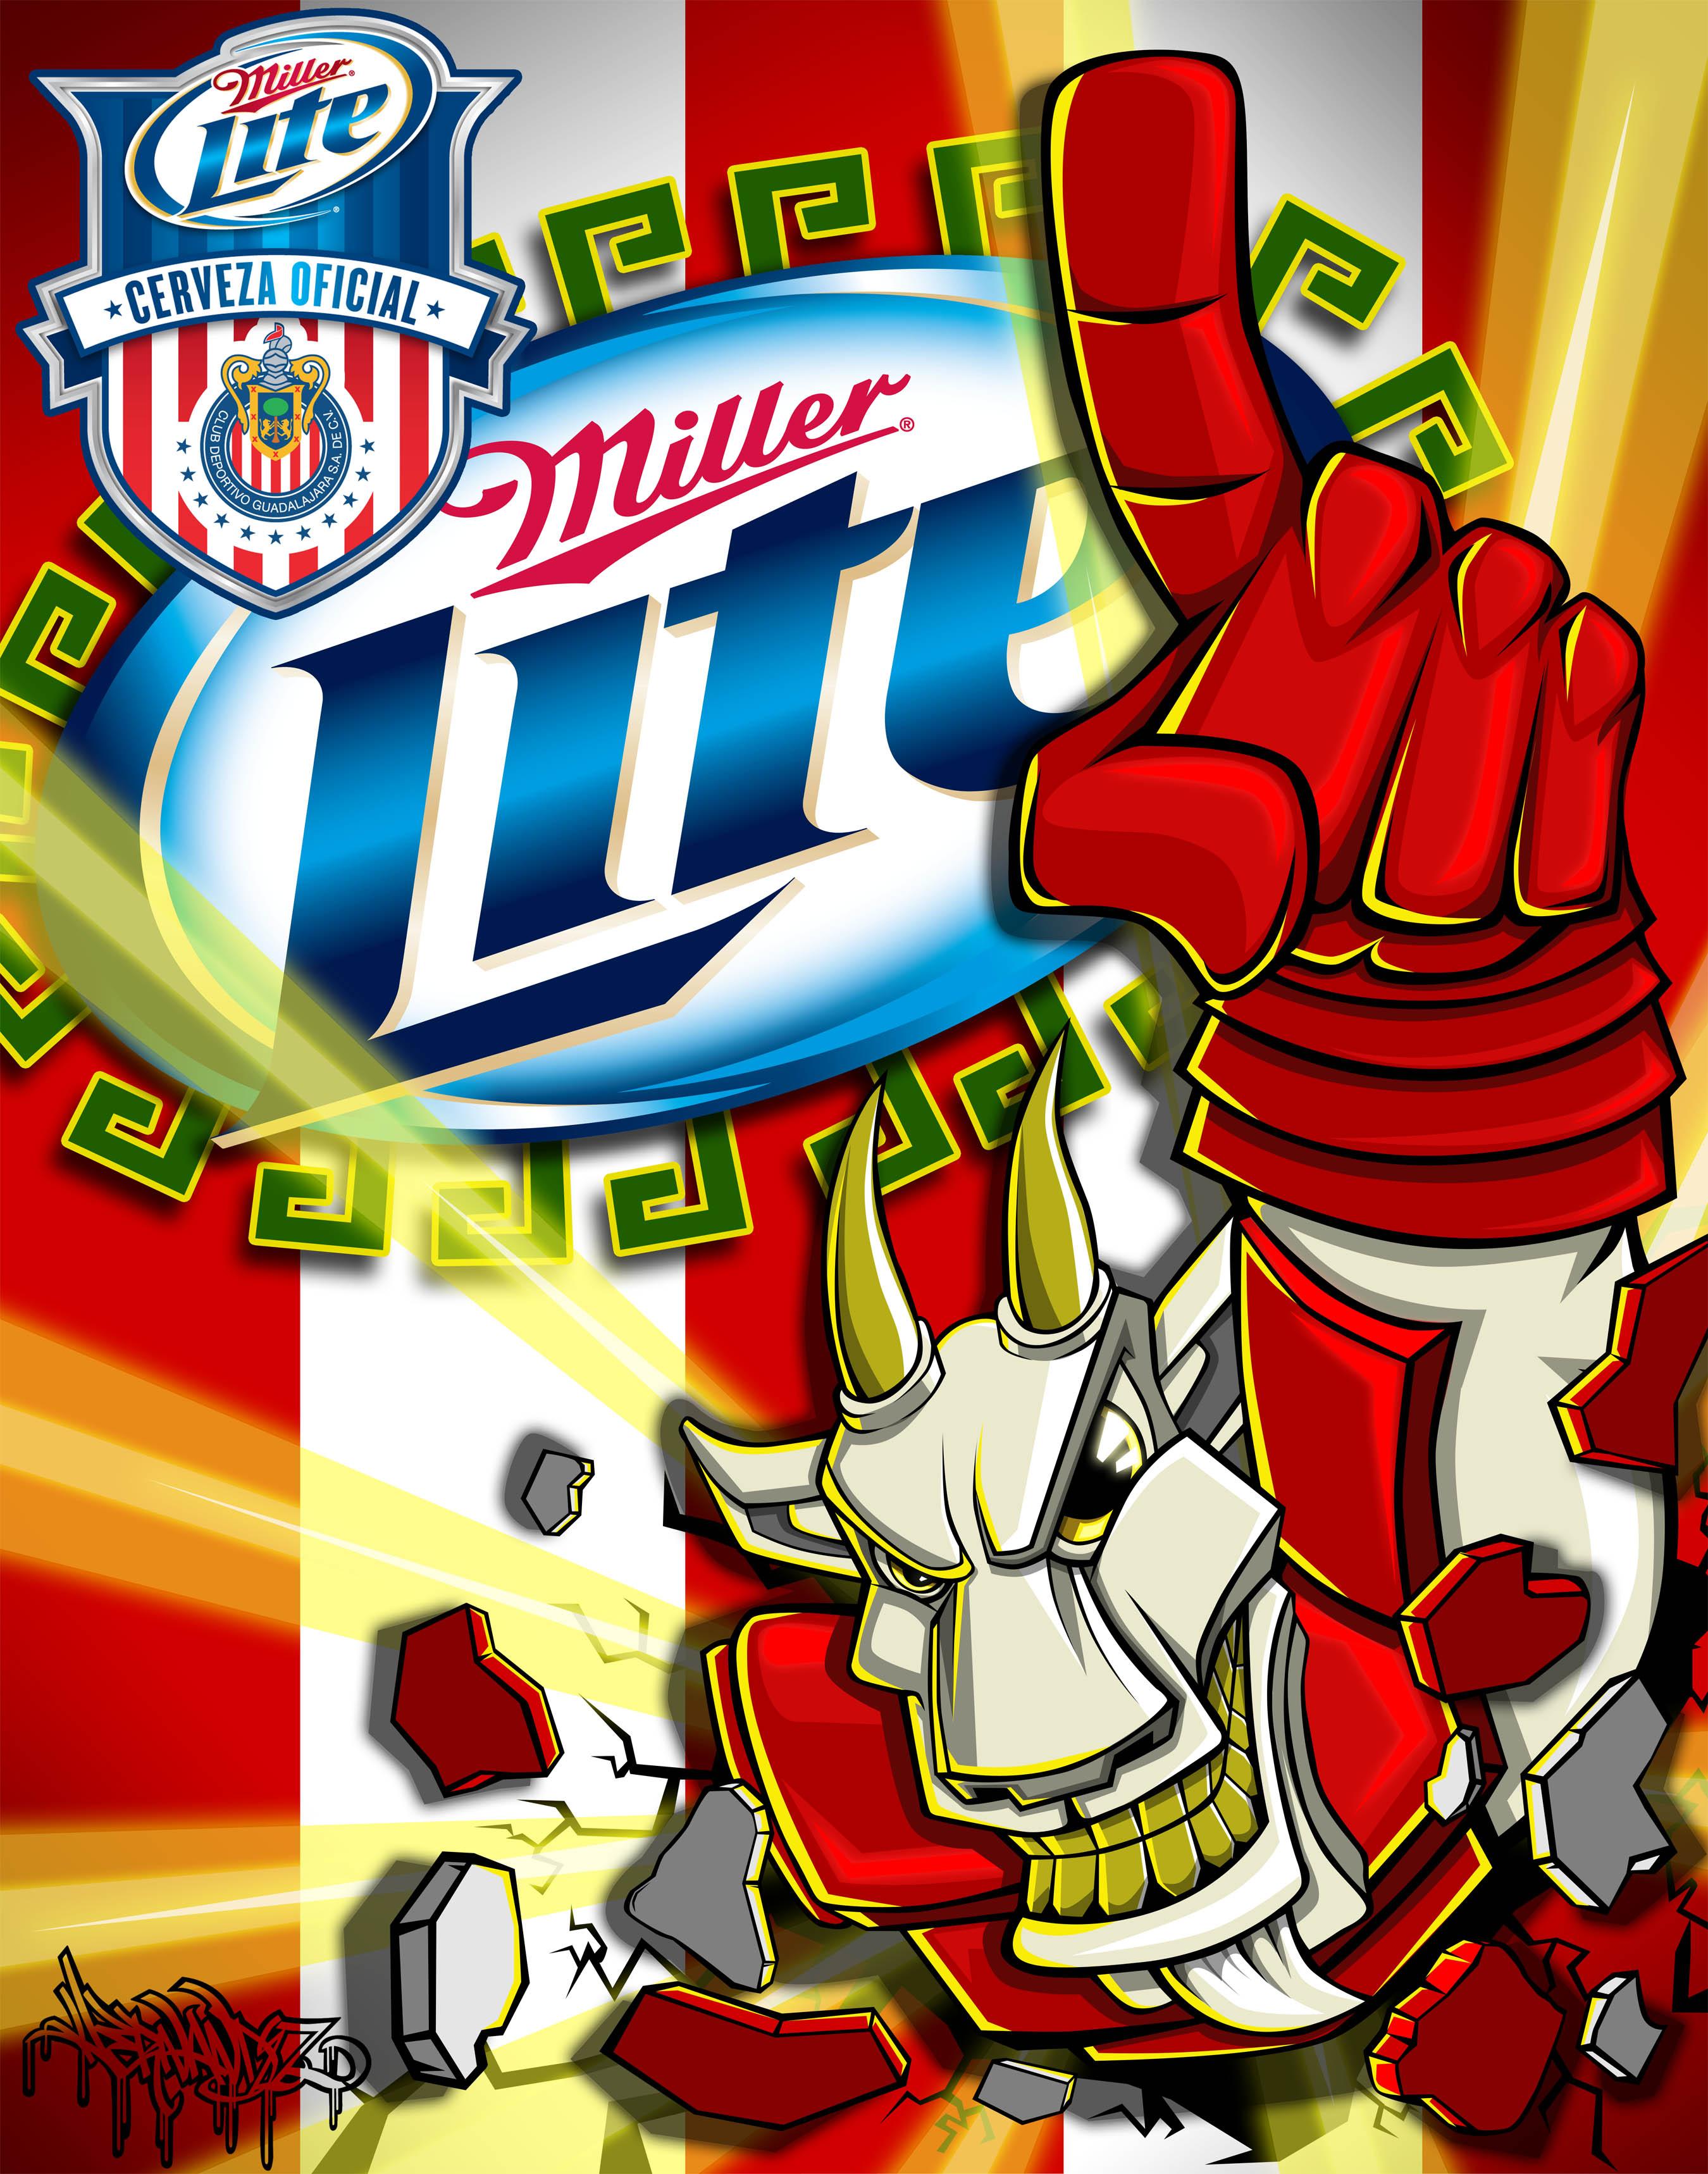 S Animation Wallpaper Vote Hernandez In The Miller Lite X Chivas Expresa Tu